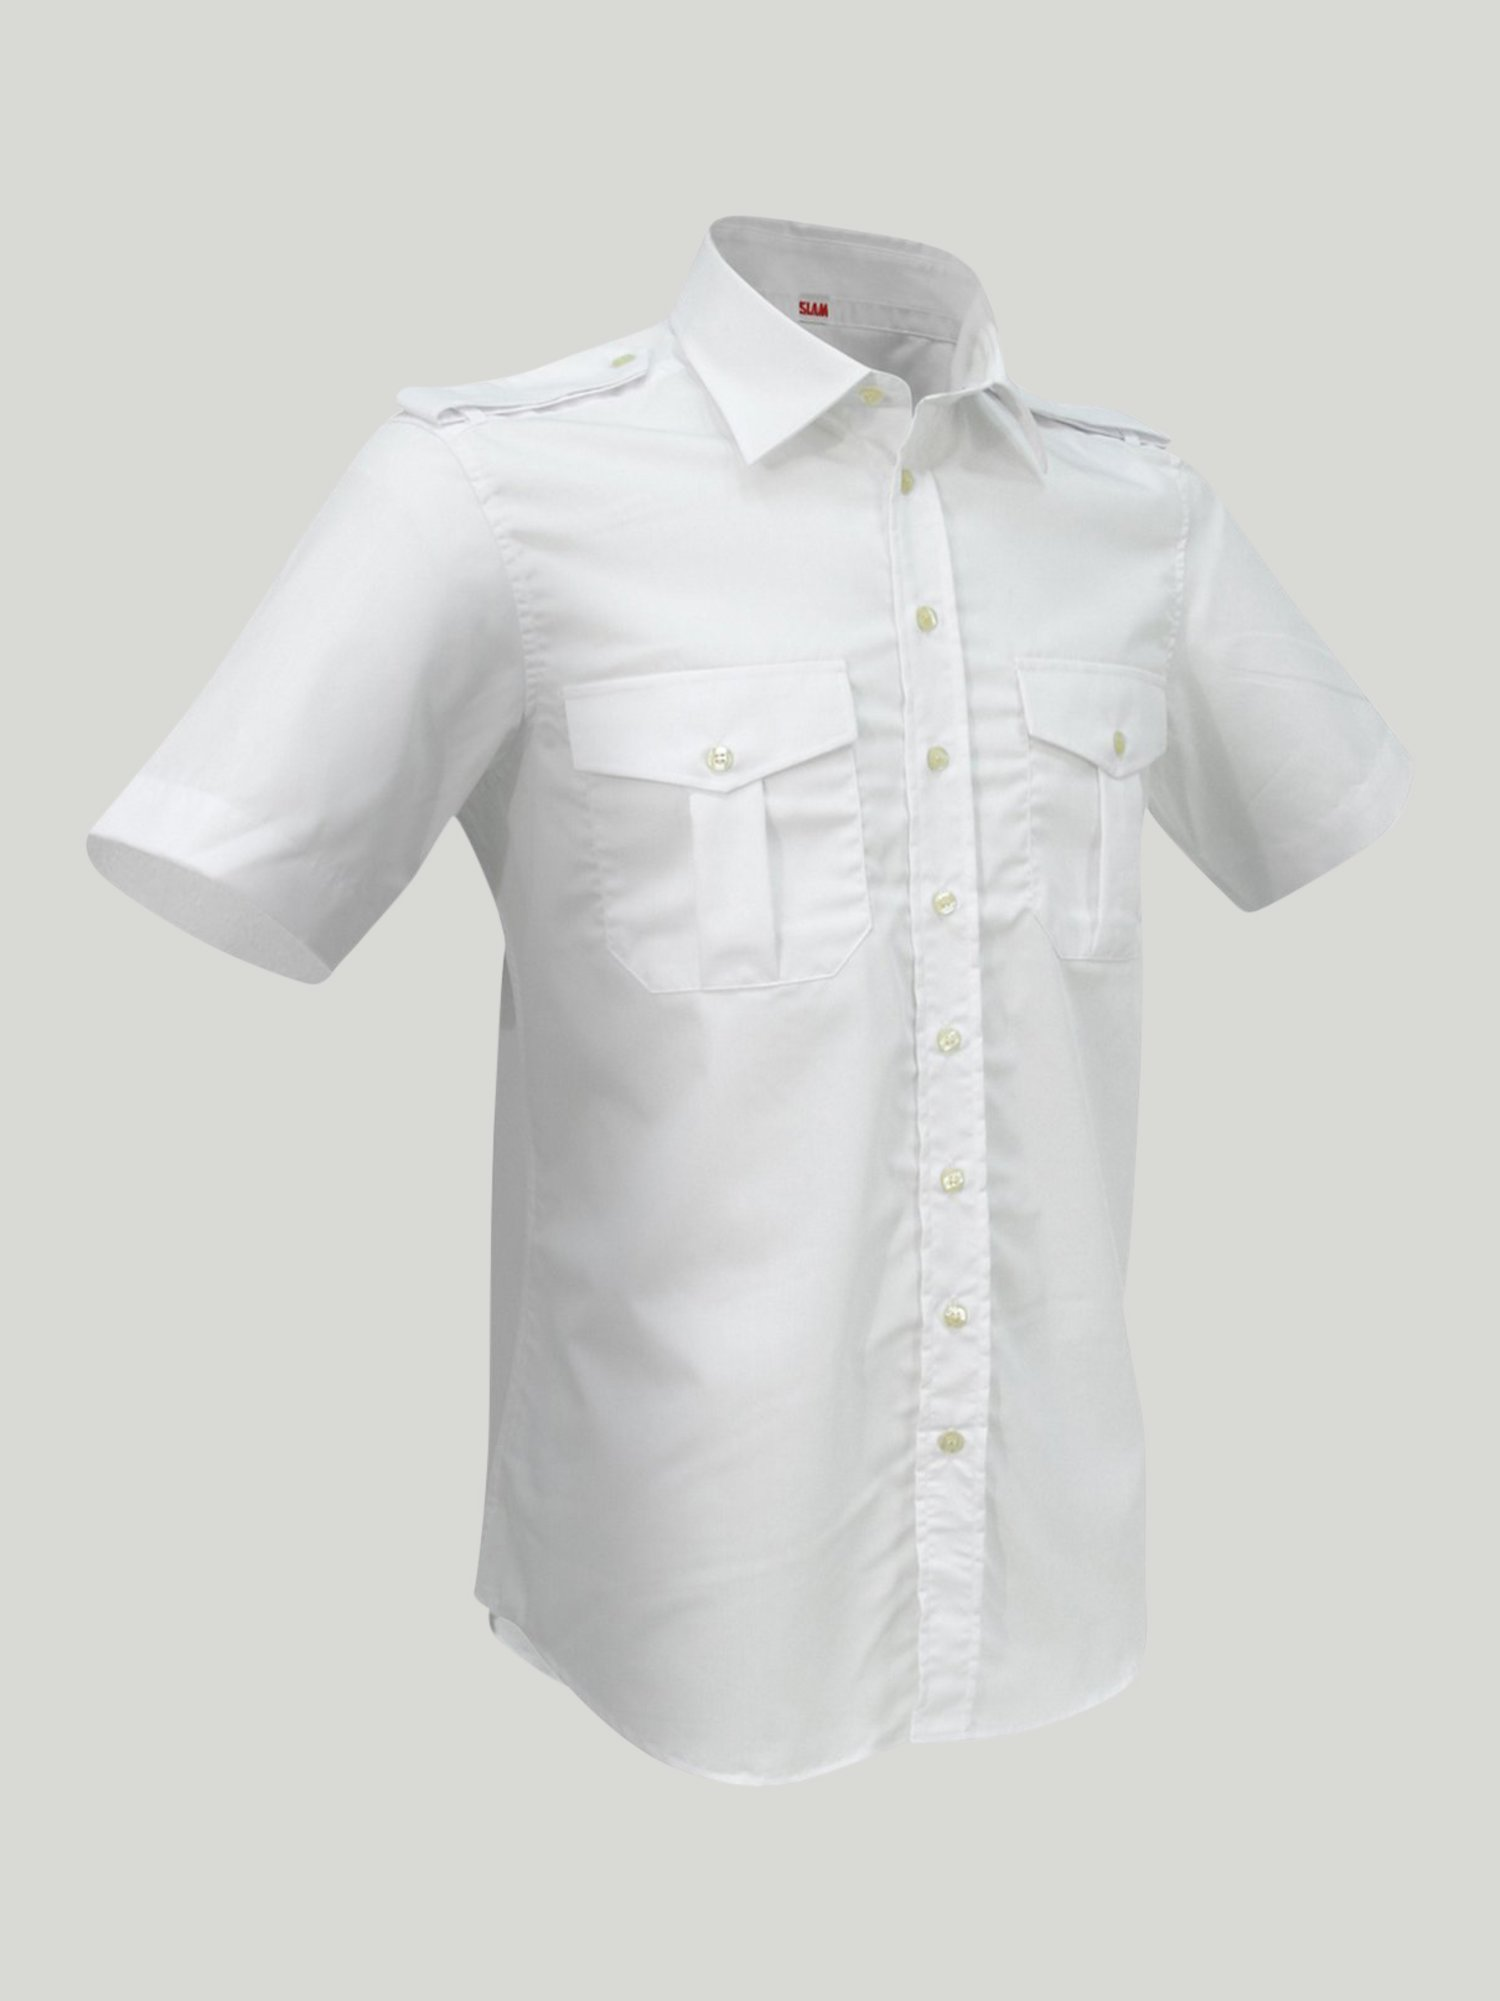 Laurel SS shirt - White